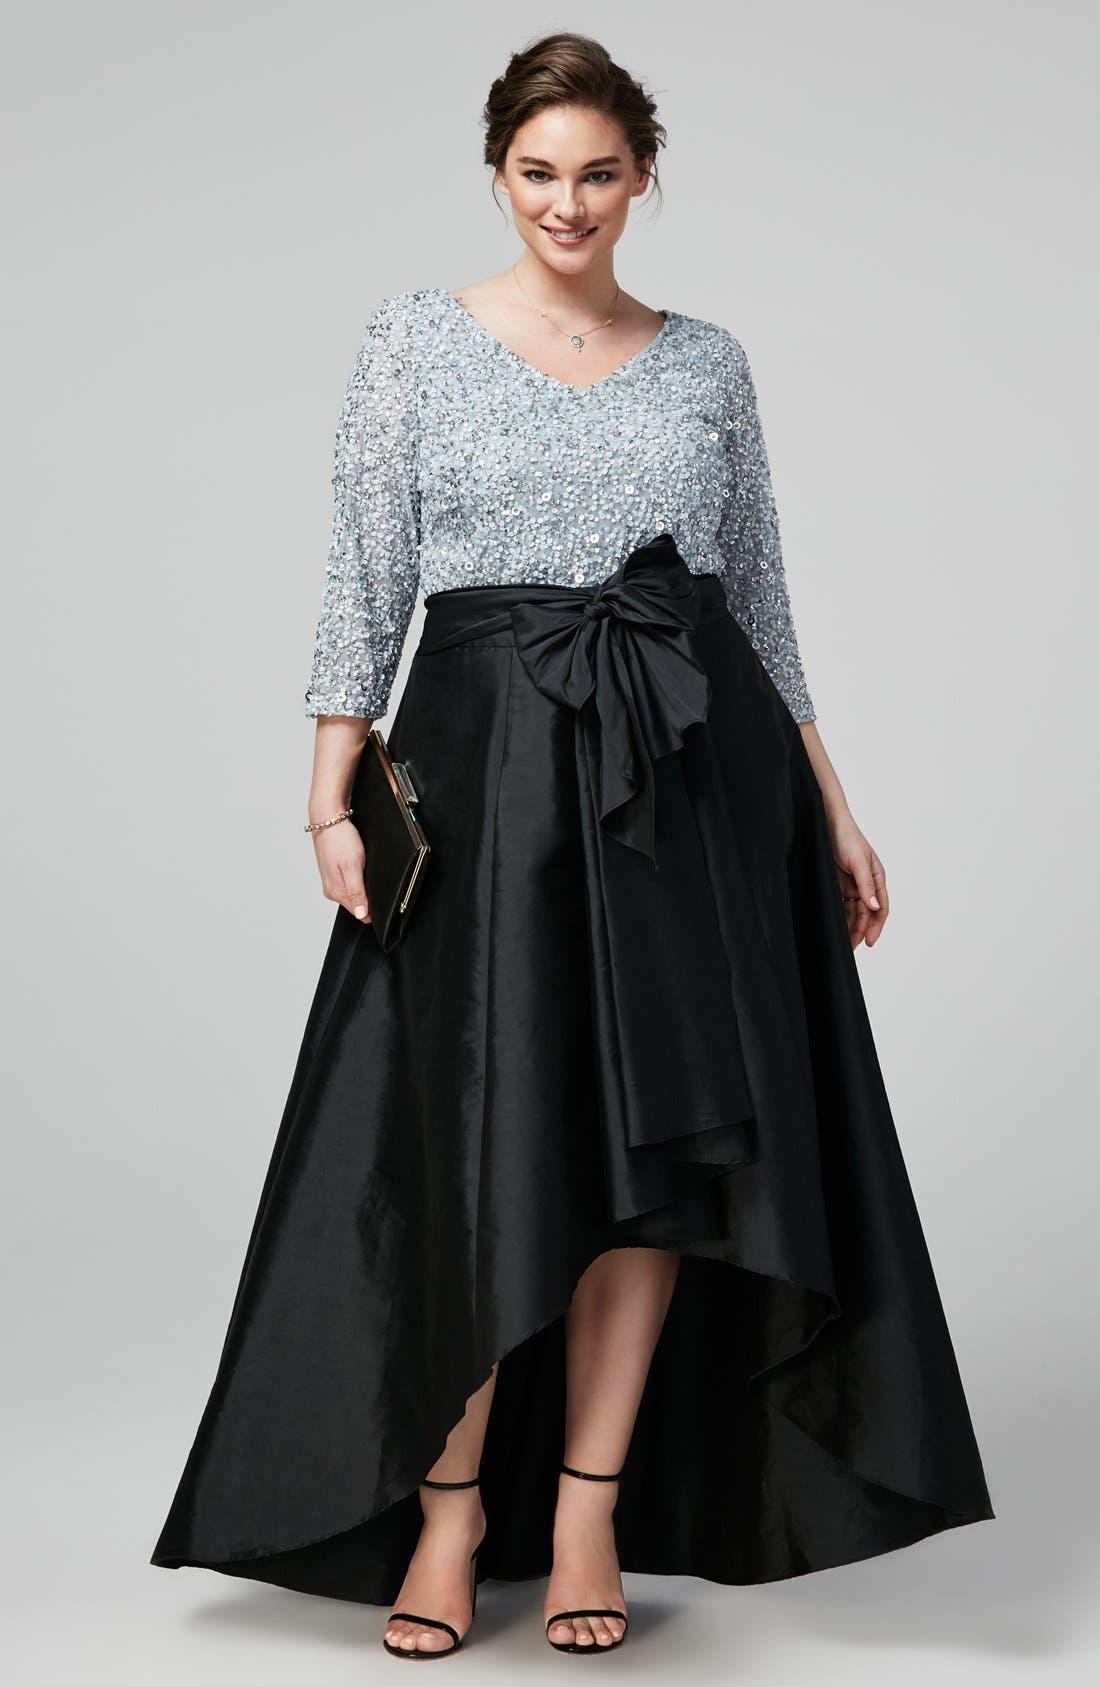 Adrianna Papell Sequin Top & Taffeta Skirt (Plus Size)